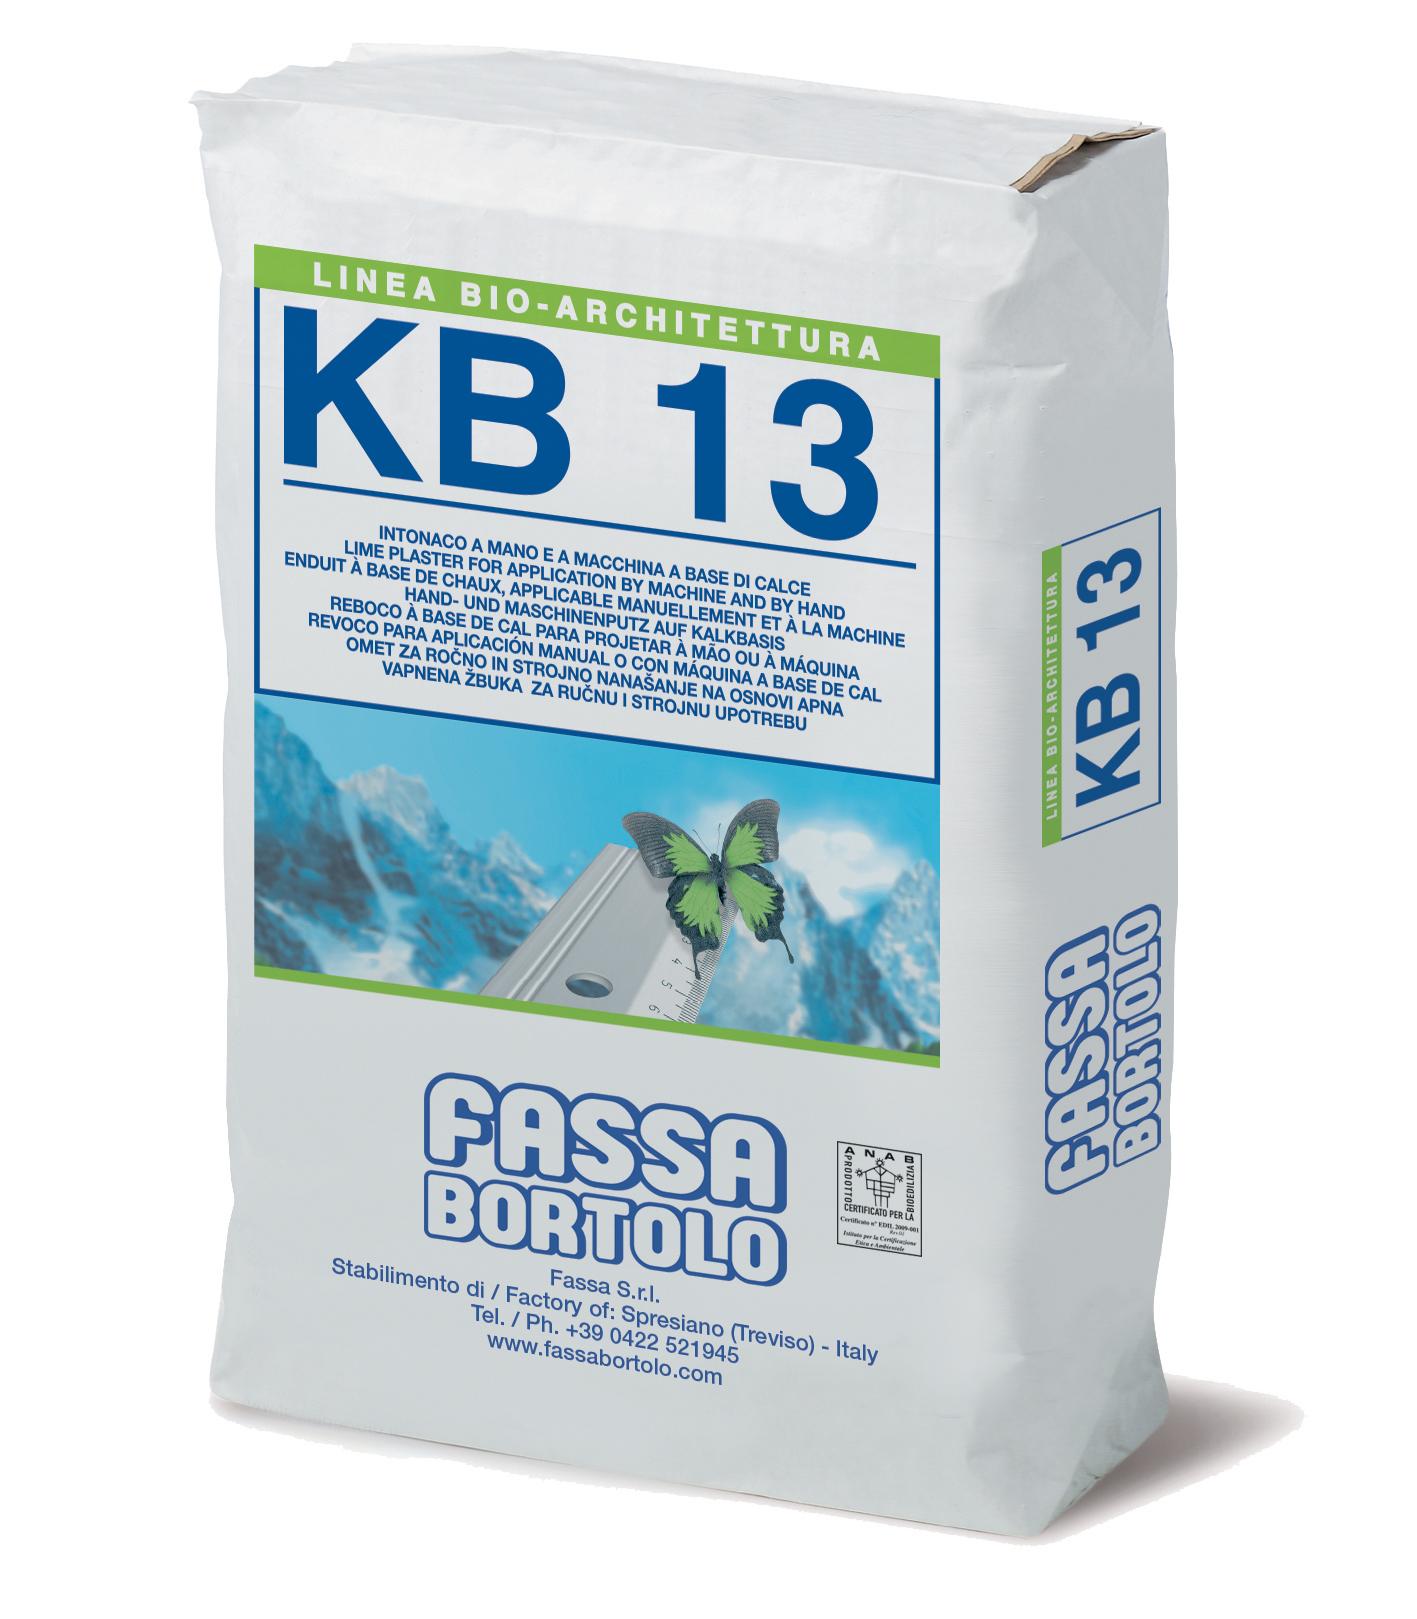 KB 13